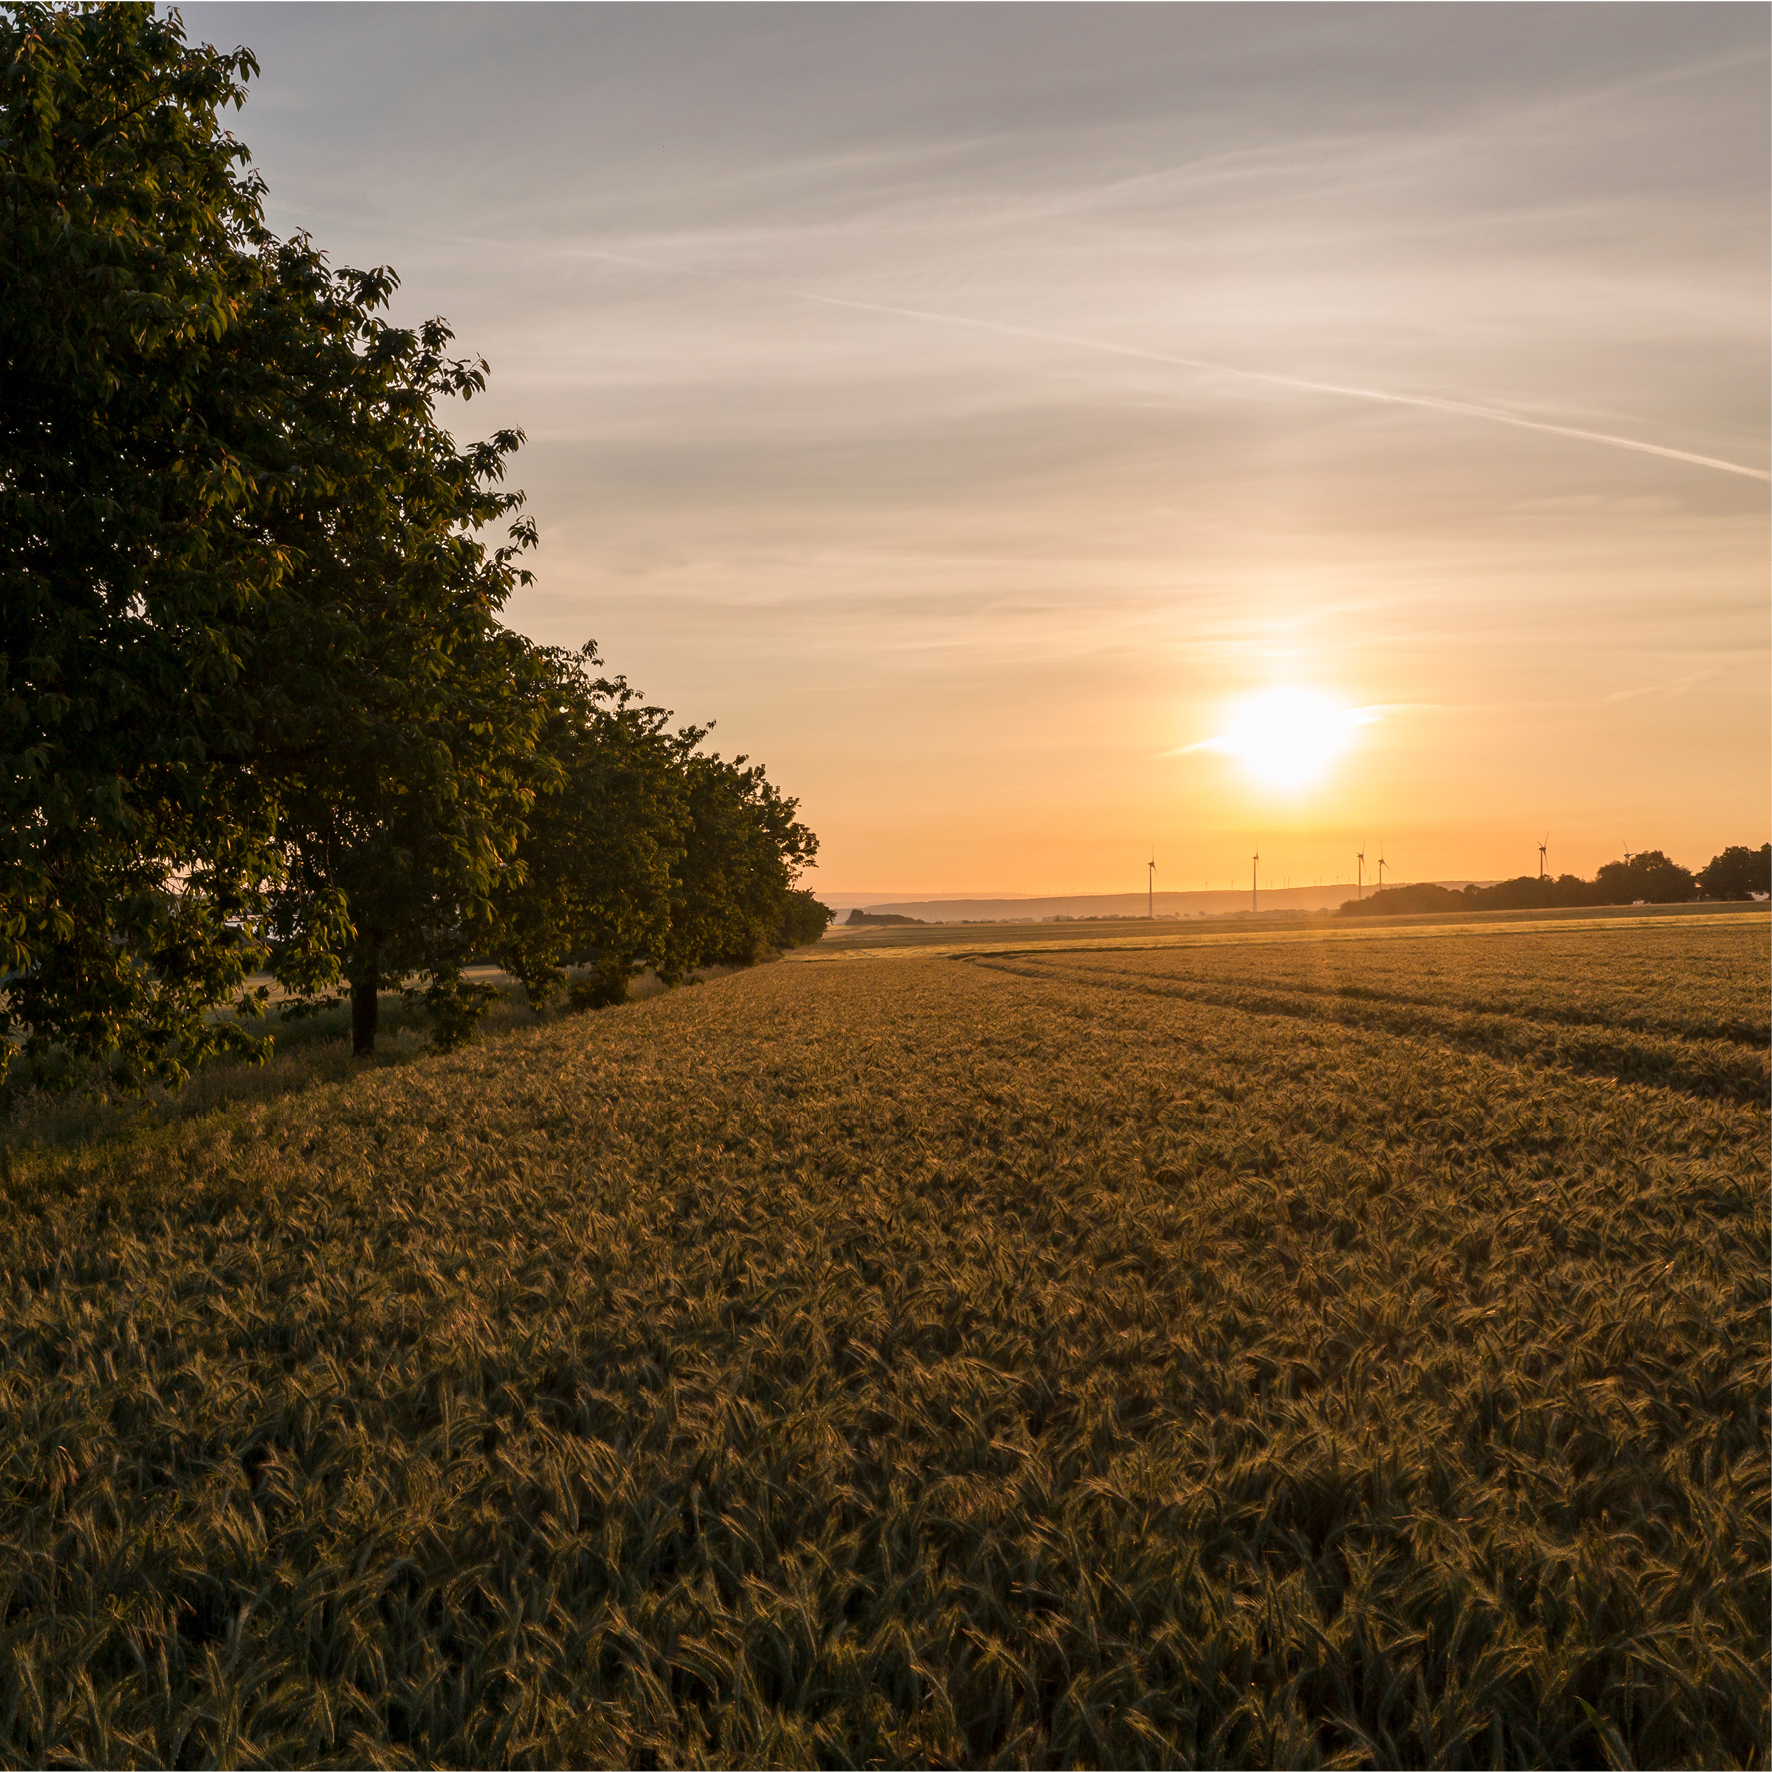 Feld im Sonnenaufgang über Meiste